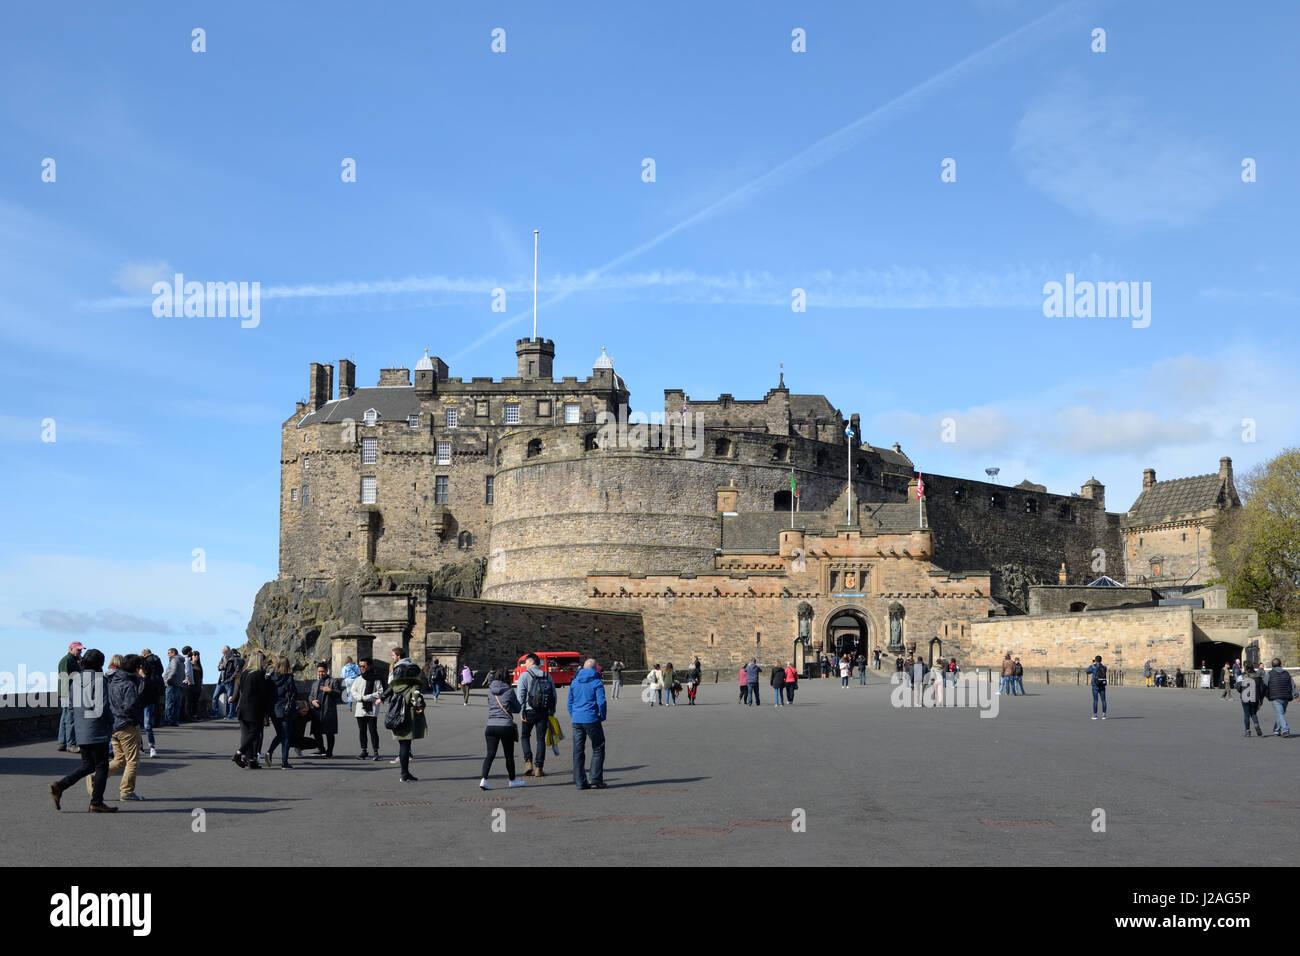 edinburgh-castle-in-scotland-stands-on-t